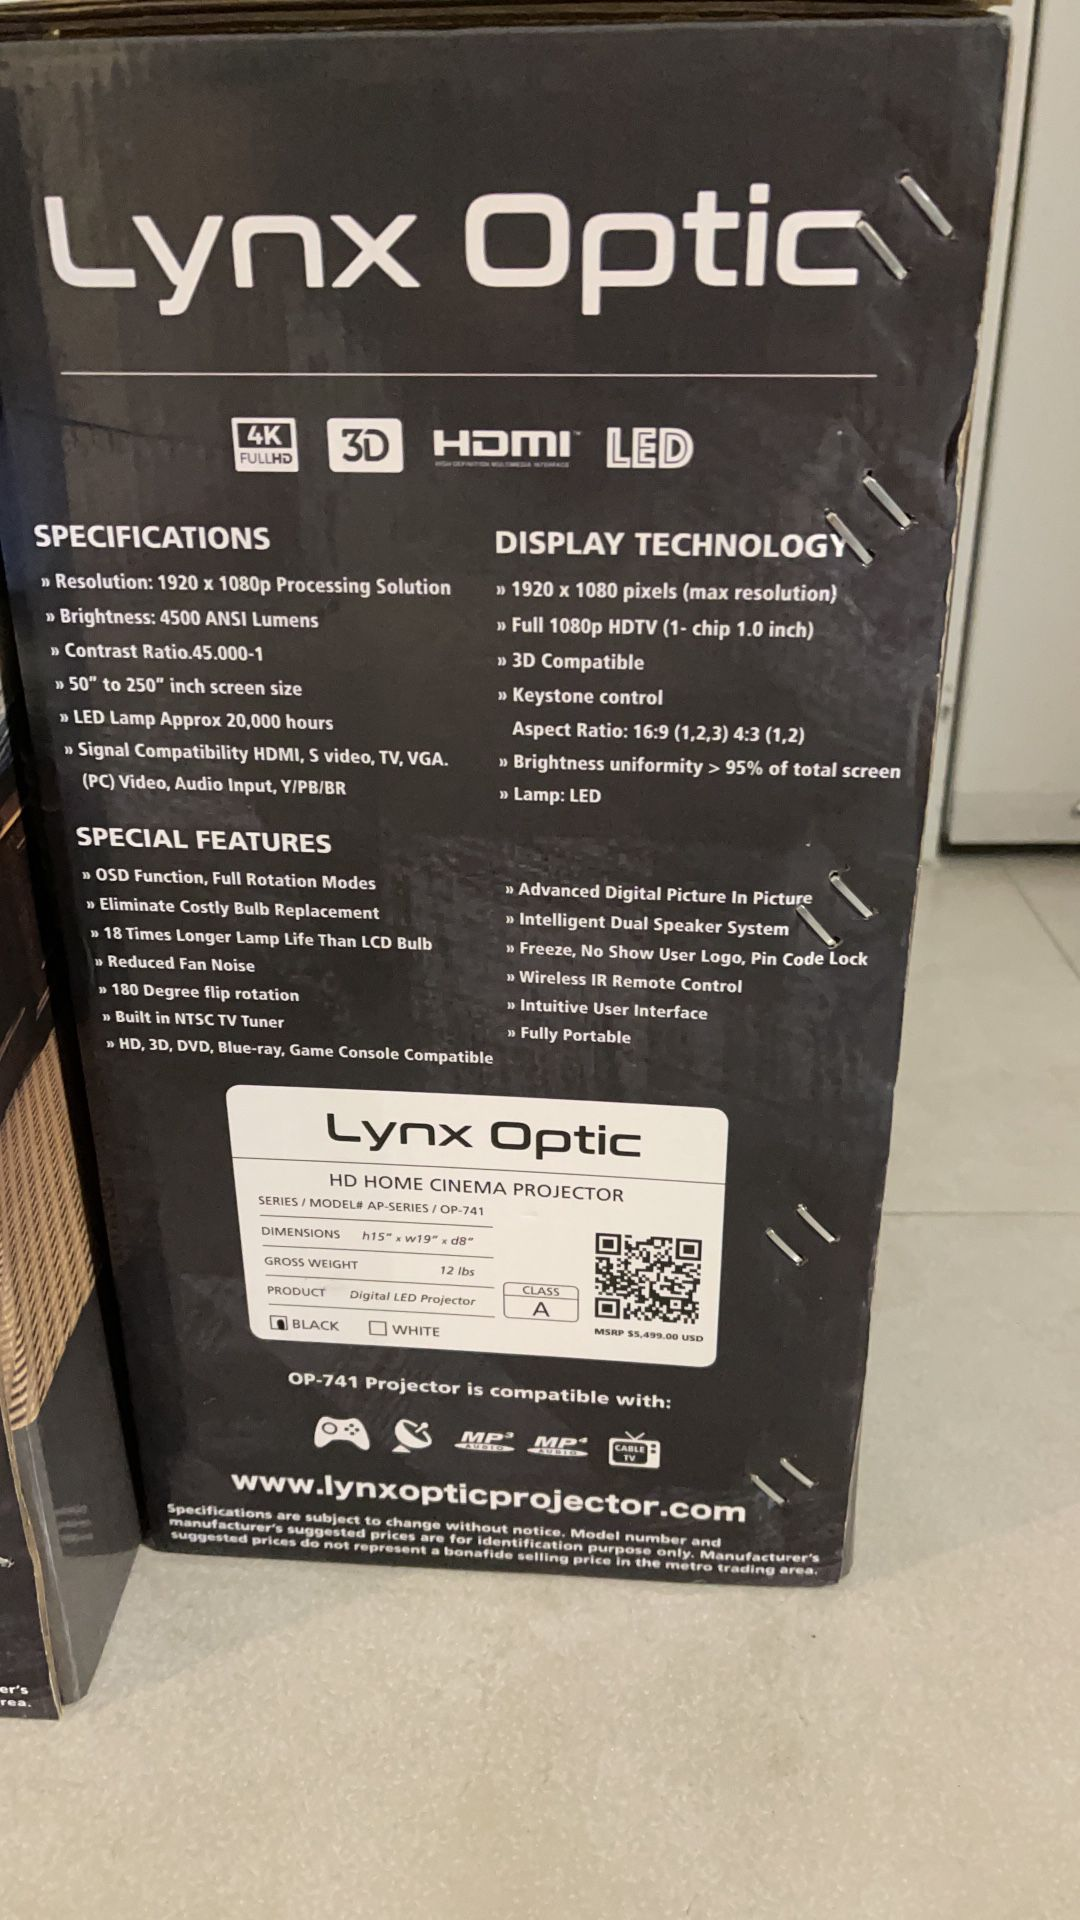 Lynx Optic Op 741 LED Smart Projector